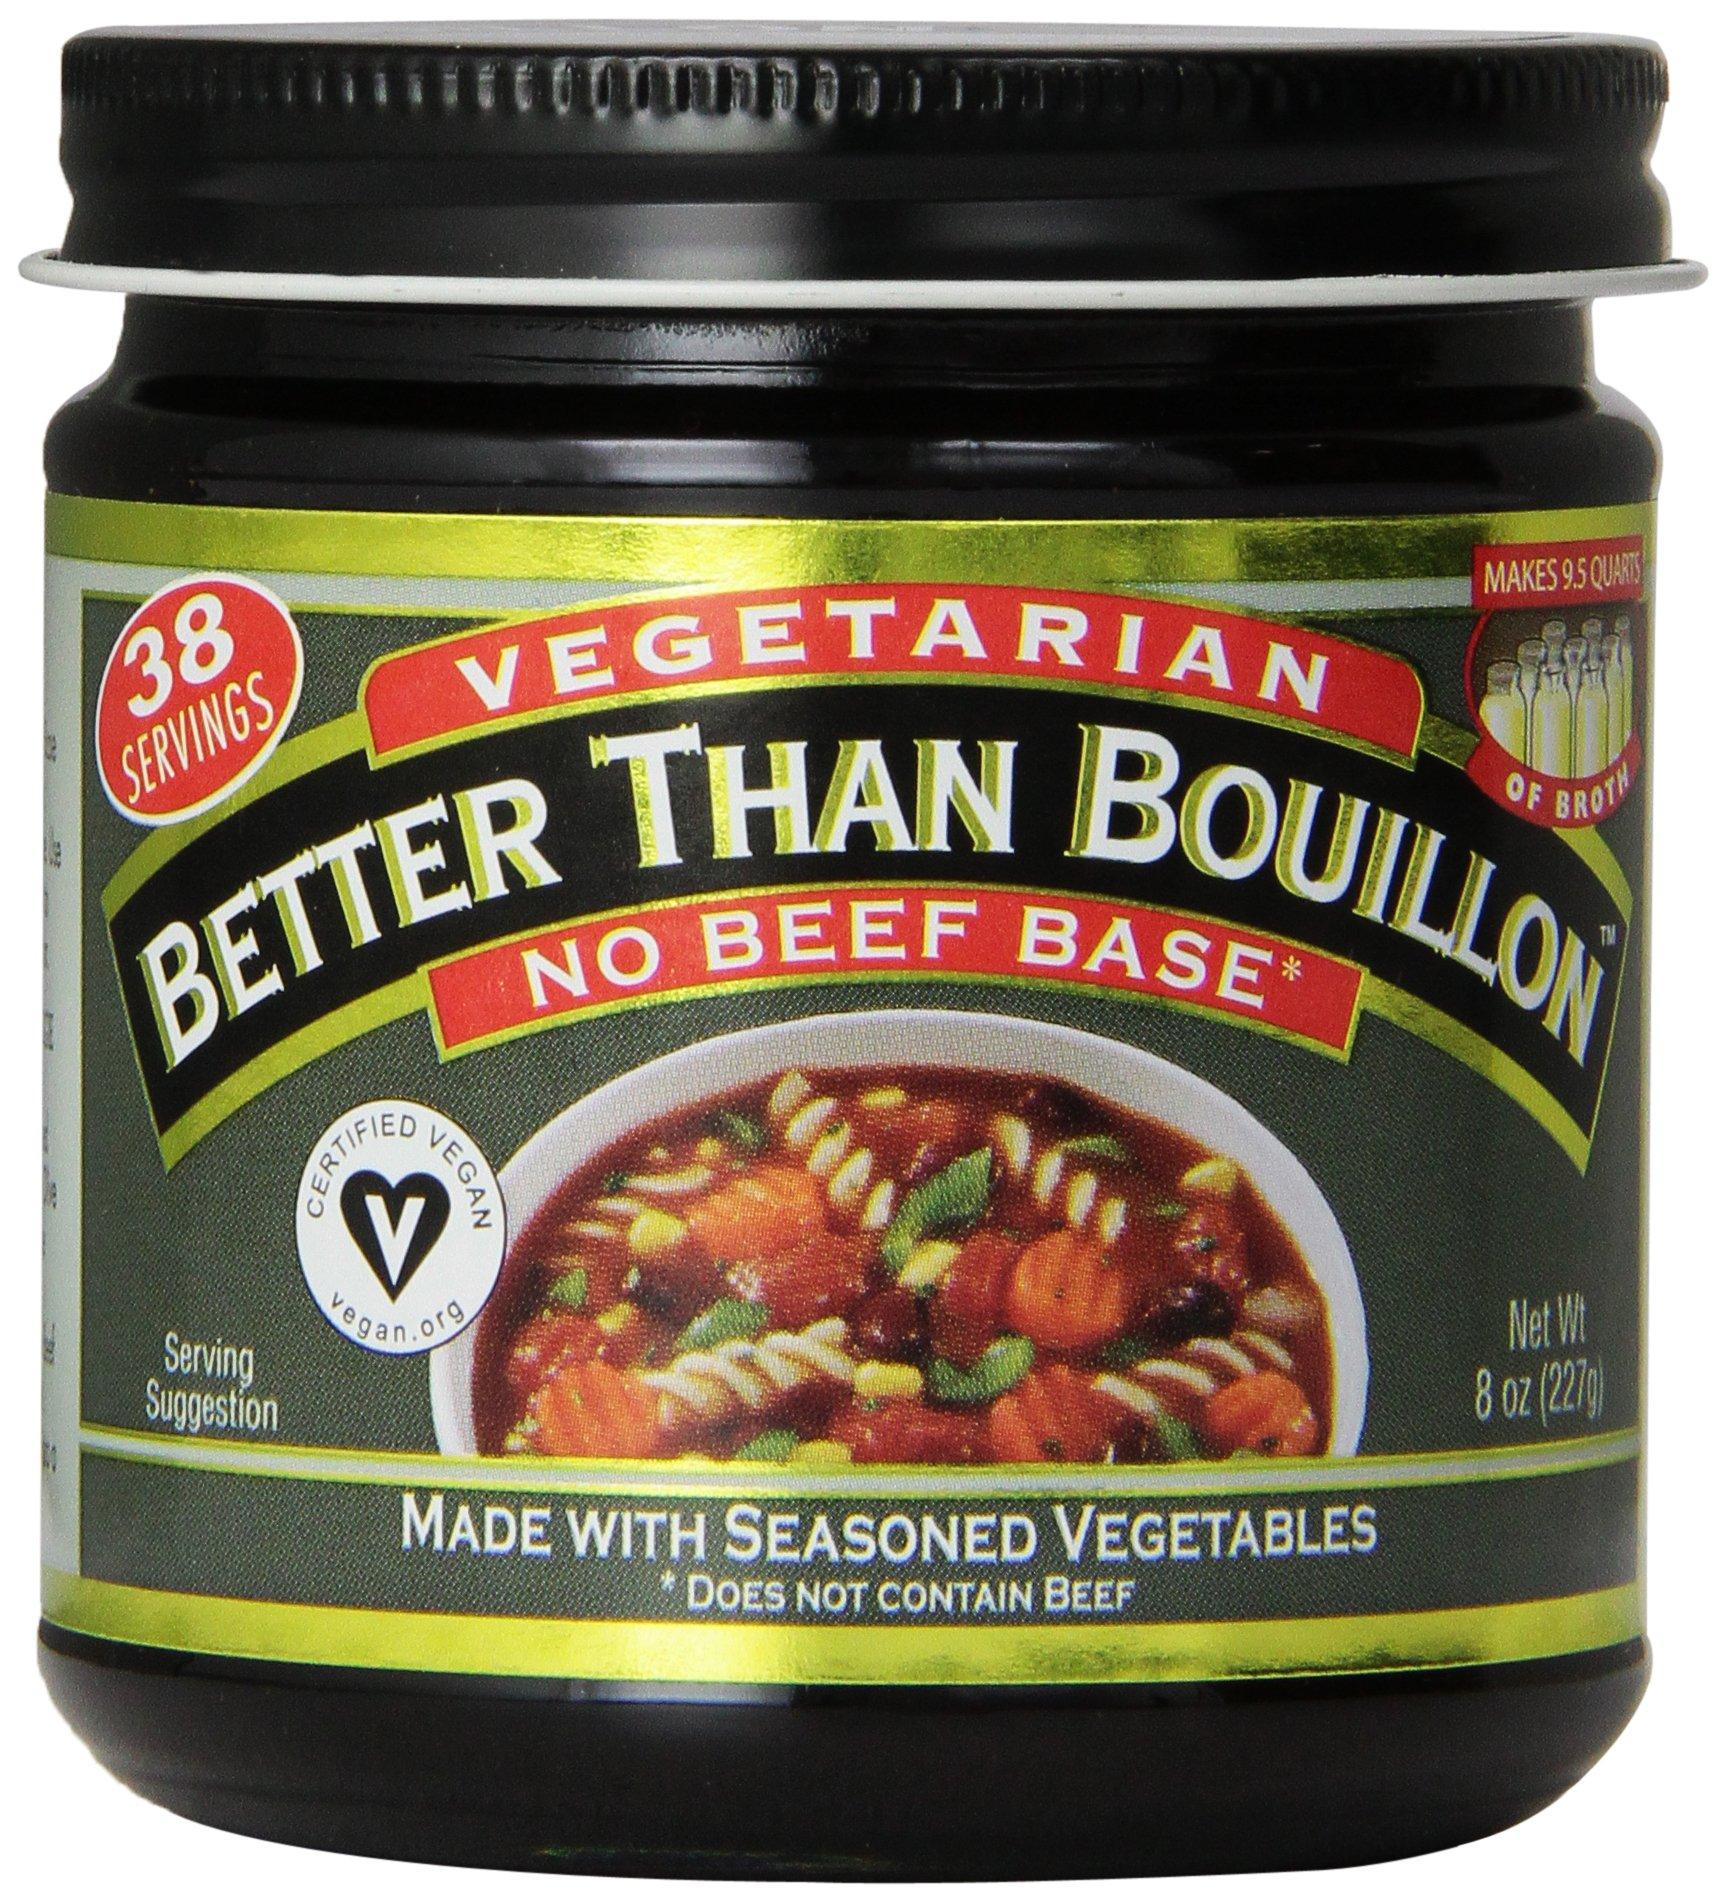 Better Than Bouillon No Beef Base Vegetarian, 8 Ounce